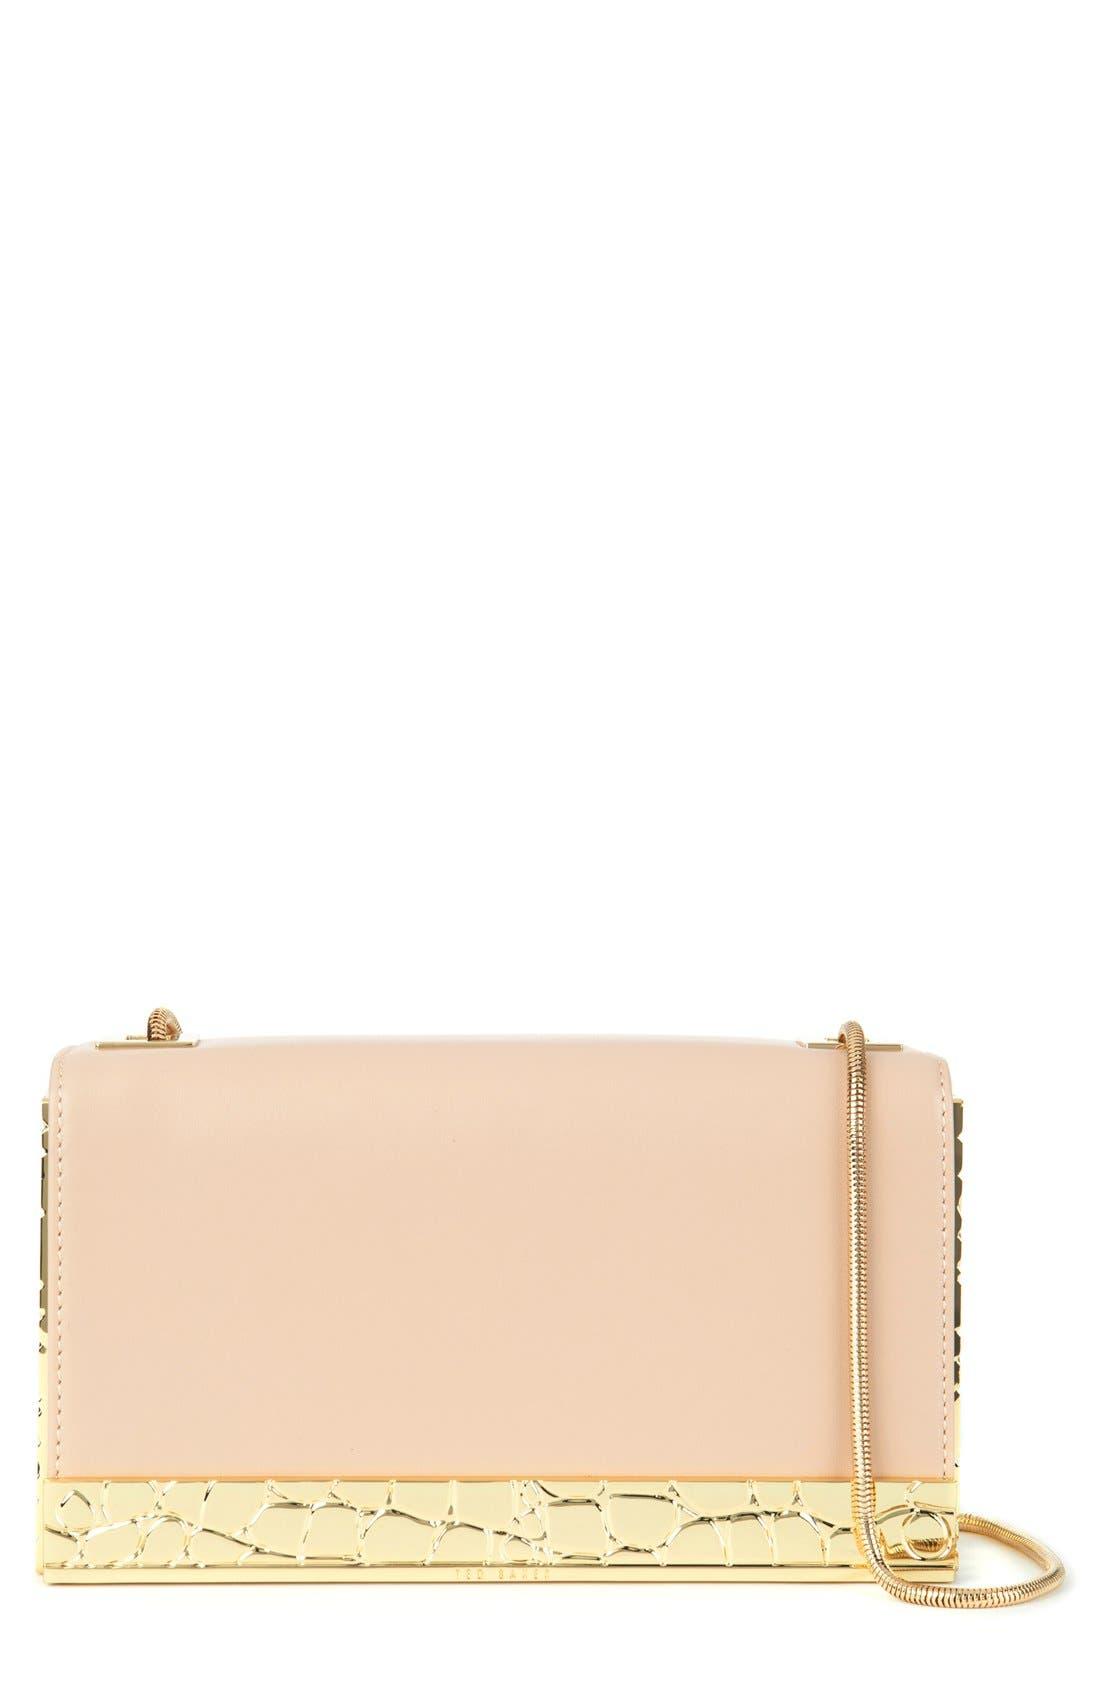 'Elise' Leather Box Clutch, Main, color, 250